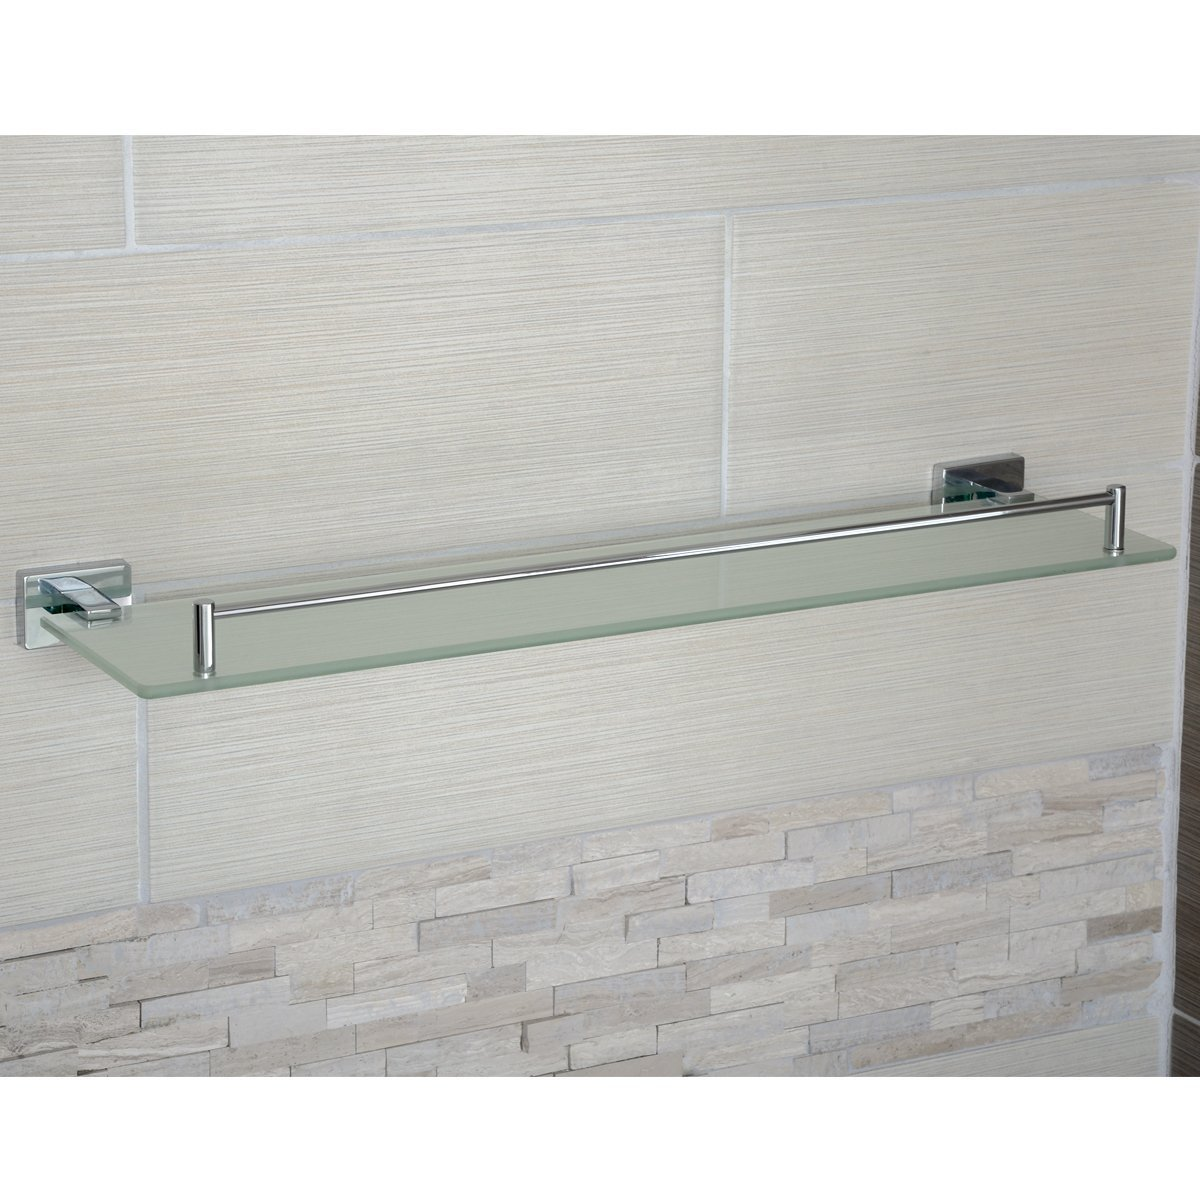 Basics Euro Double Towel Bar 21-Inch AB-BR822-PC Polished Chrome